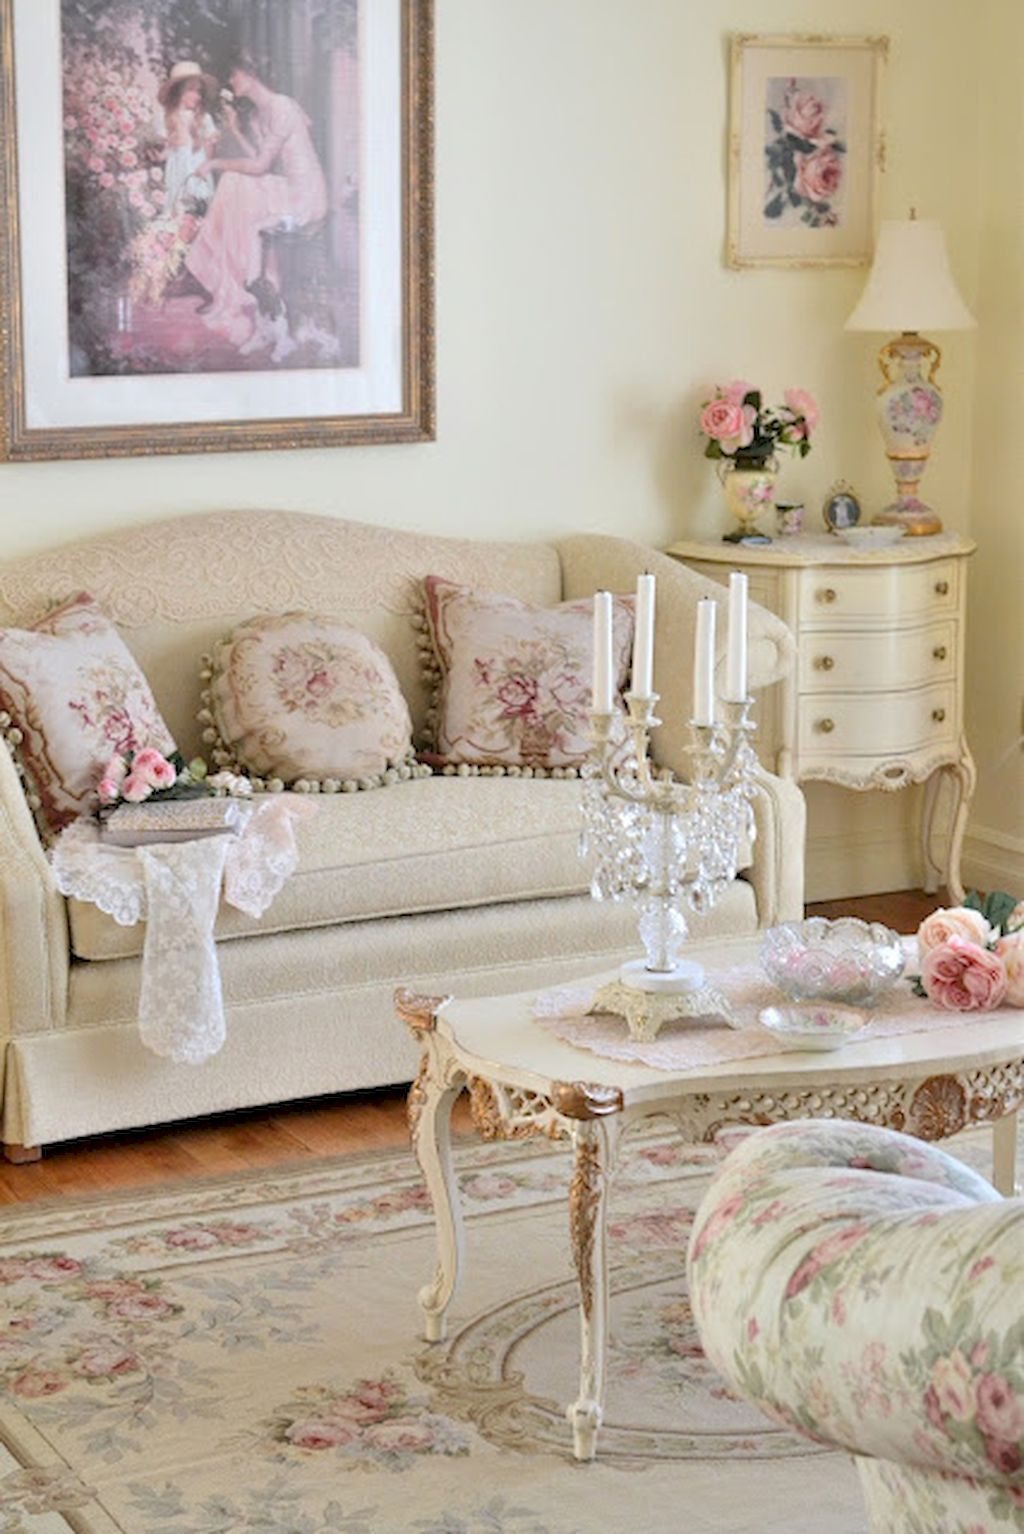 40 Stunning Shabby Chic Living Room Decor Ideas | Shabby chic living ...